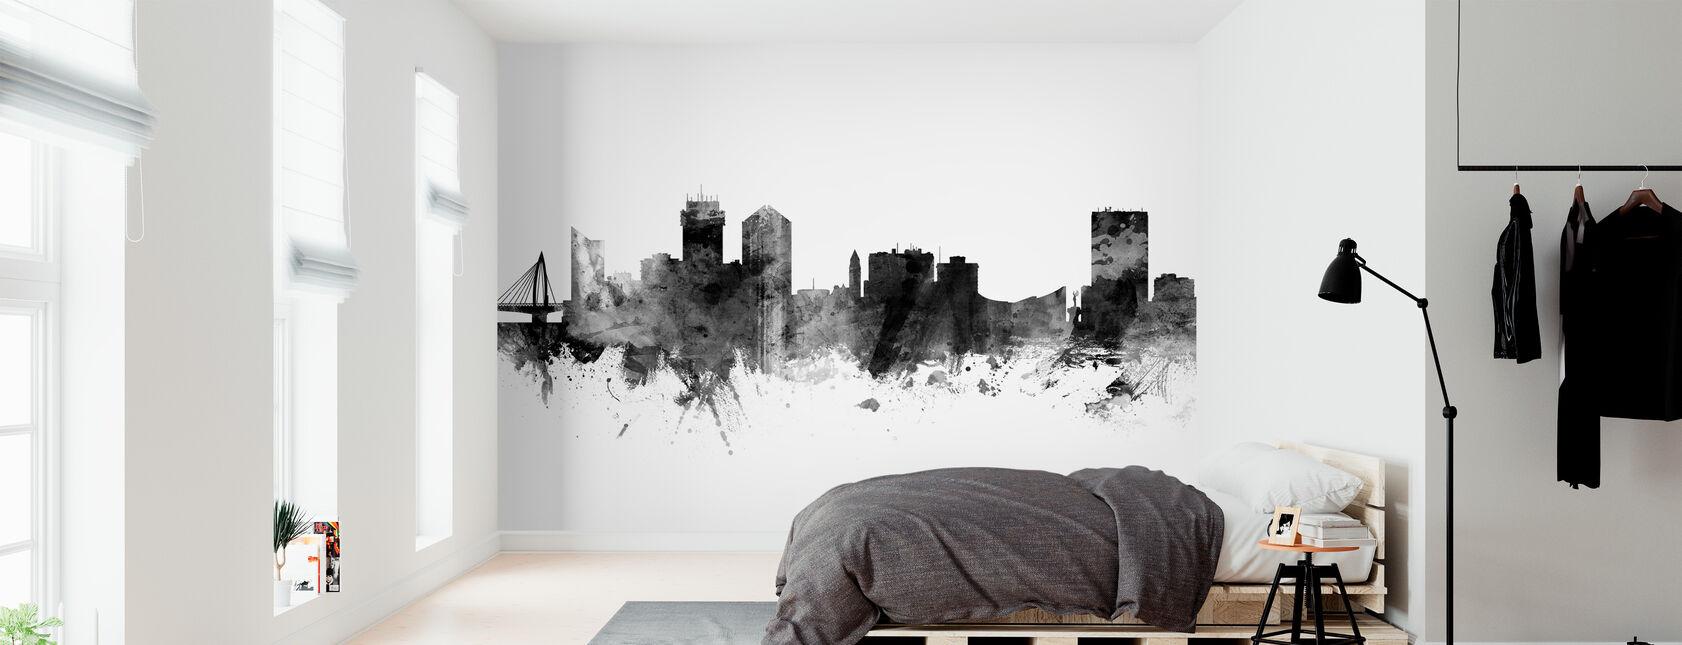 Wichita Kansas Skyline, svart och vitt - Tapet - Sovrum